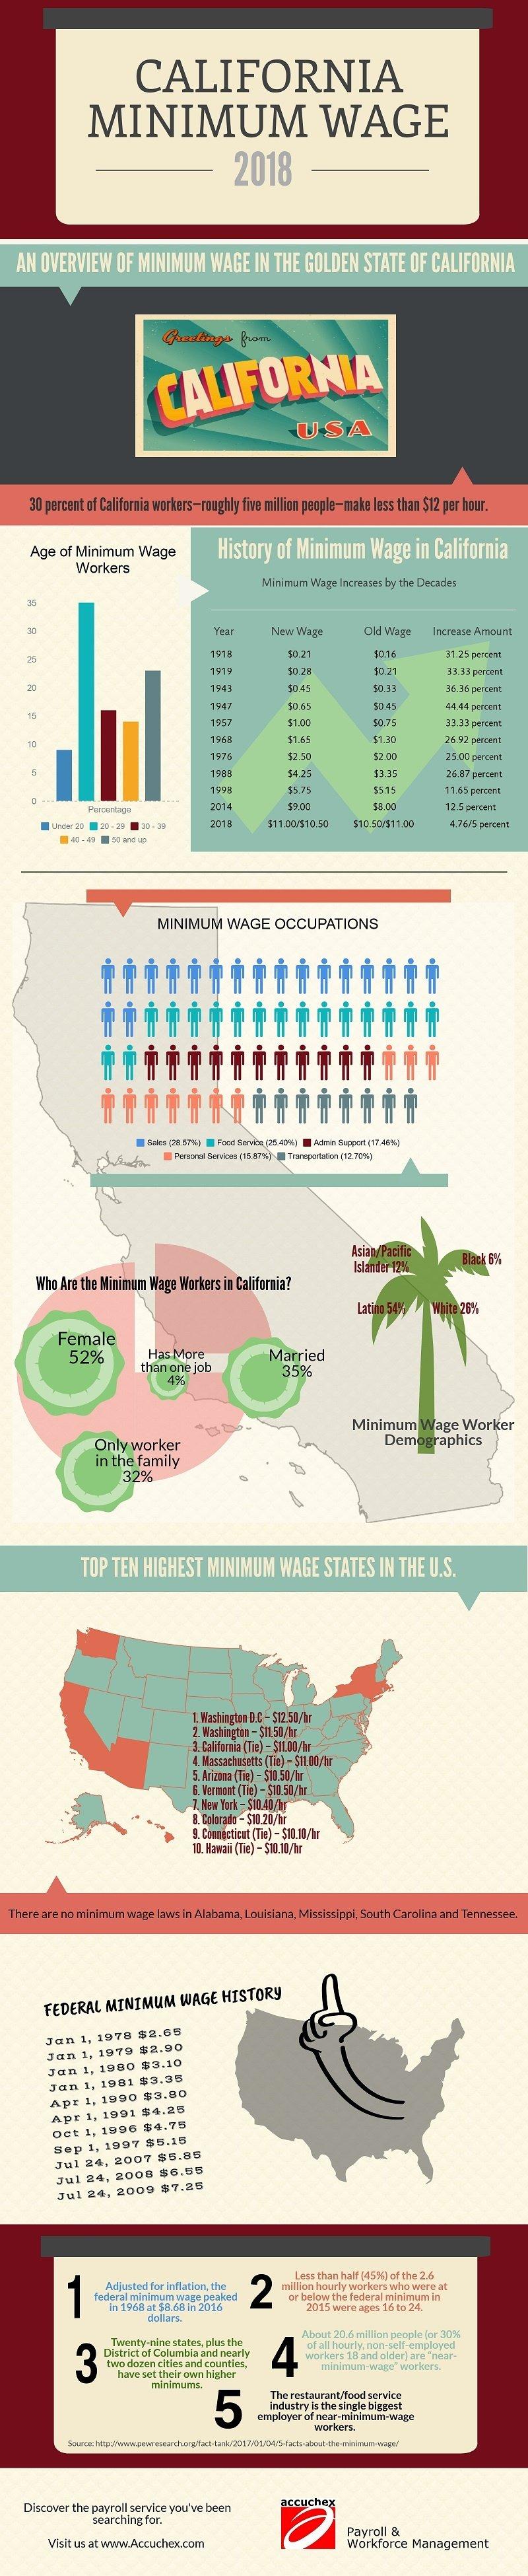 california payroll calculator 2015